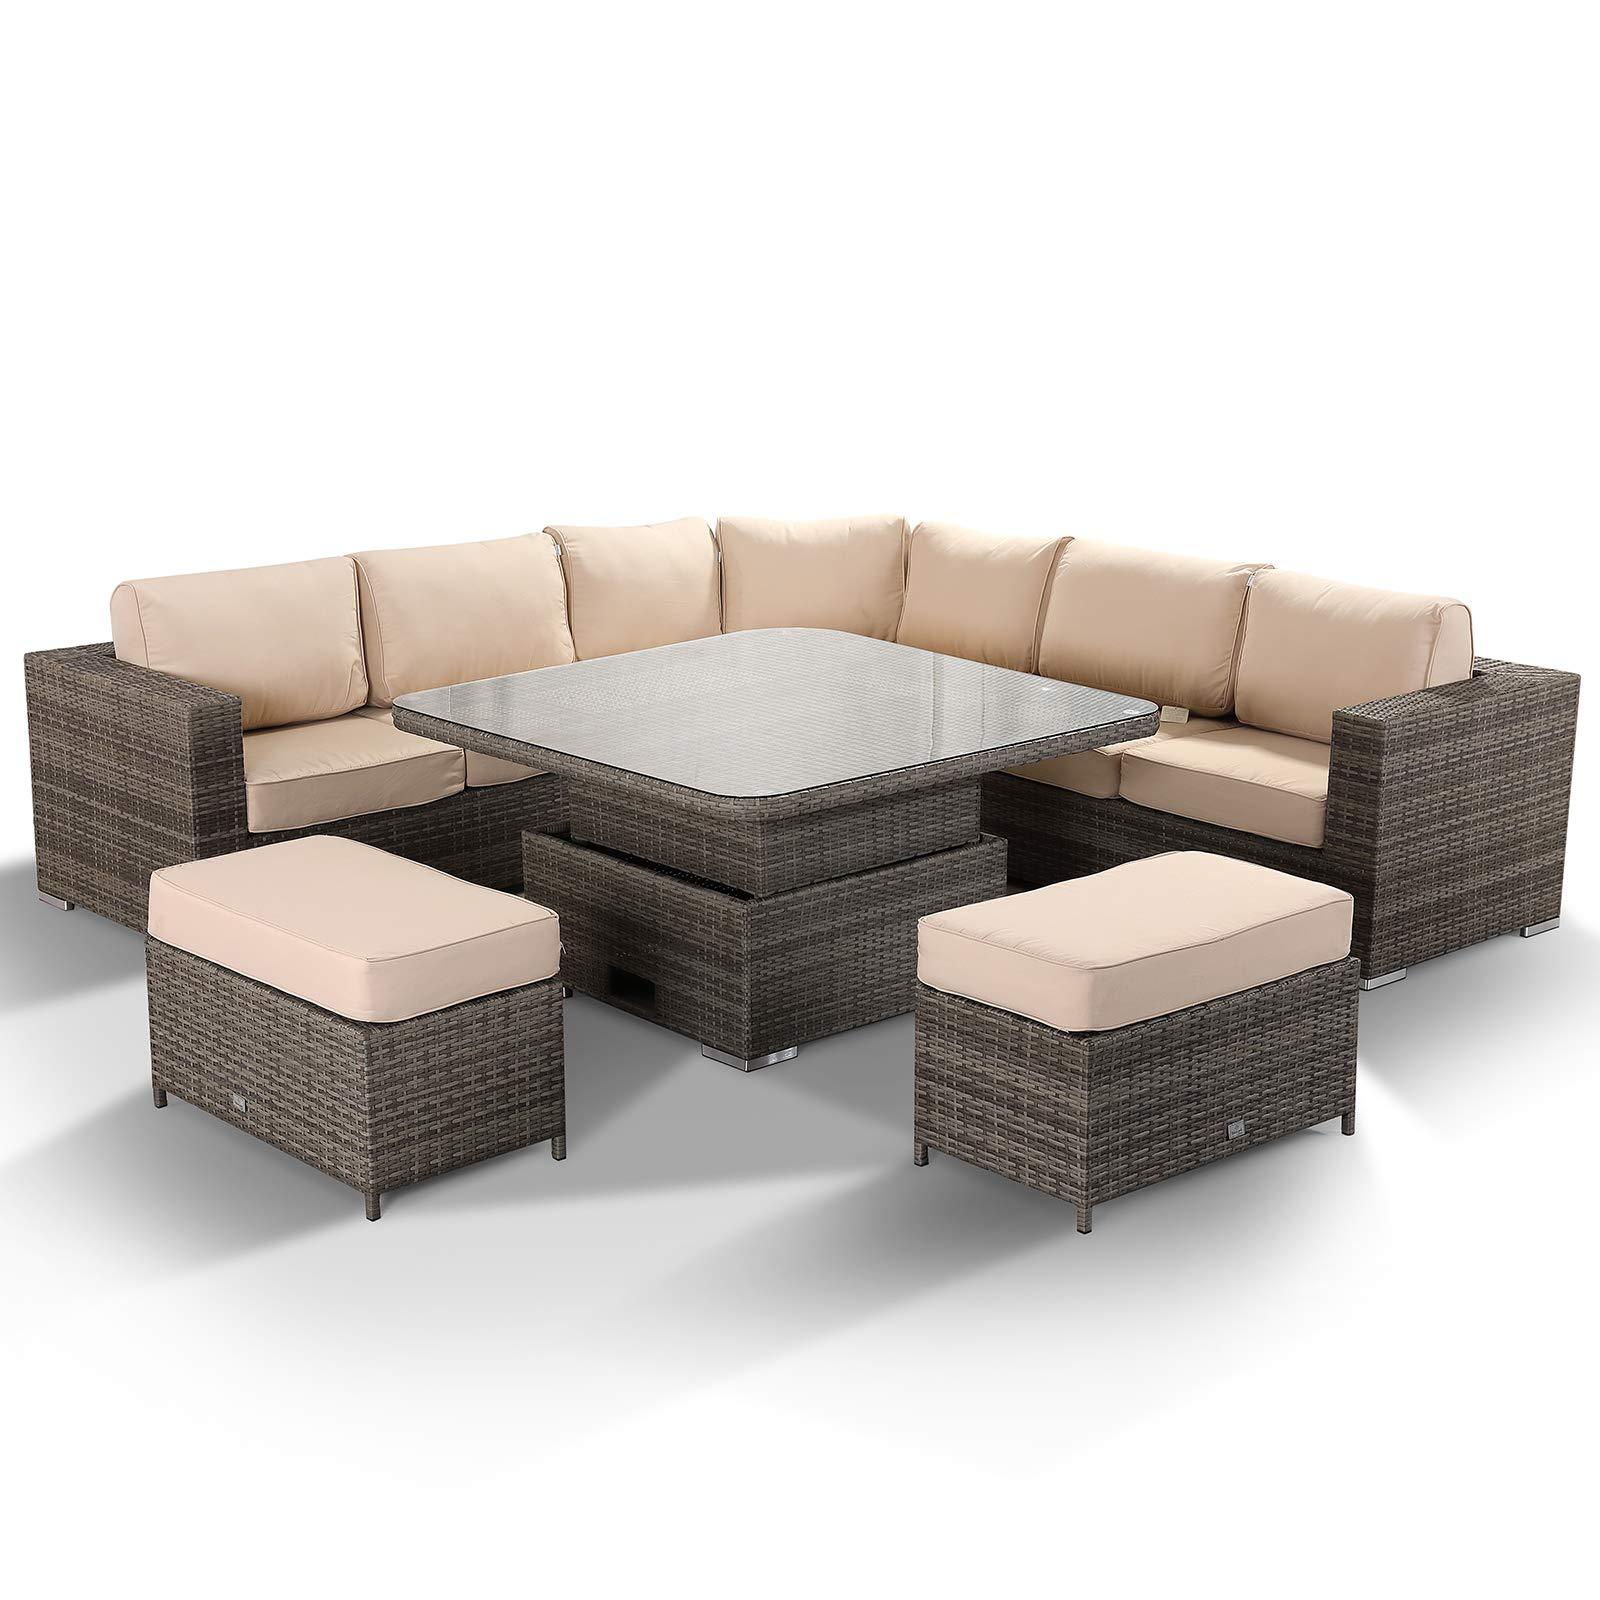 Rattanpark Outdoor Rattan garden Furniture Cambridge Range Round Corner  Sofa Set with Rising Table in Grey